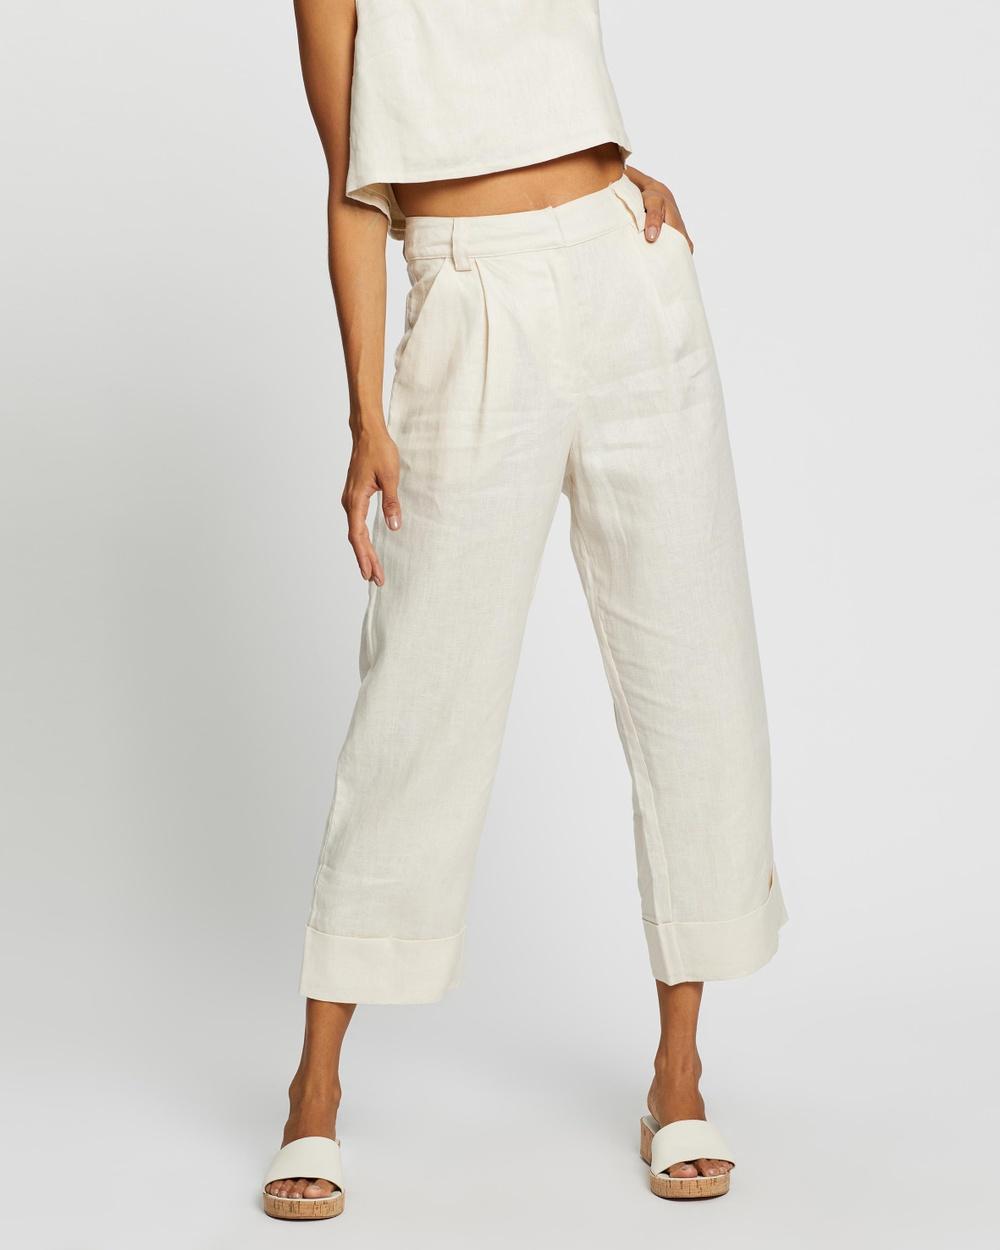 AERE Tailored Linen Pants Sand